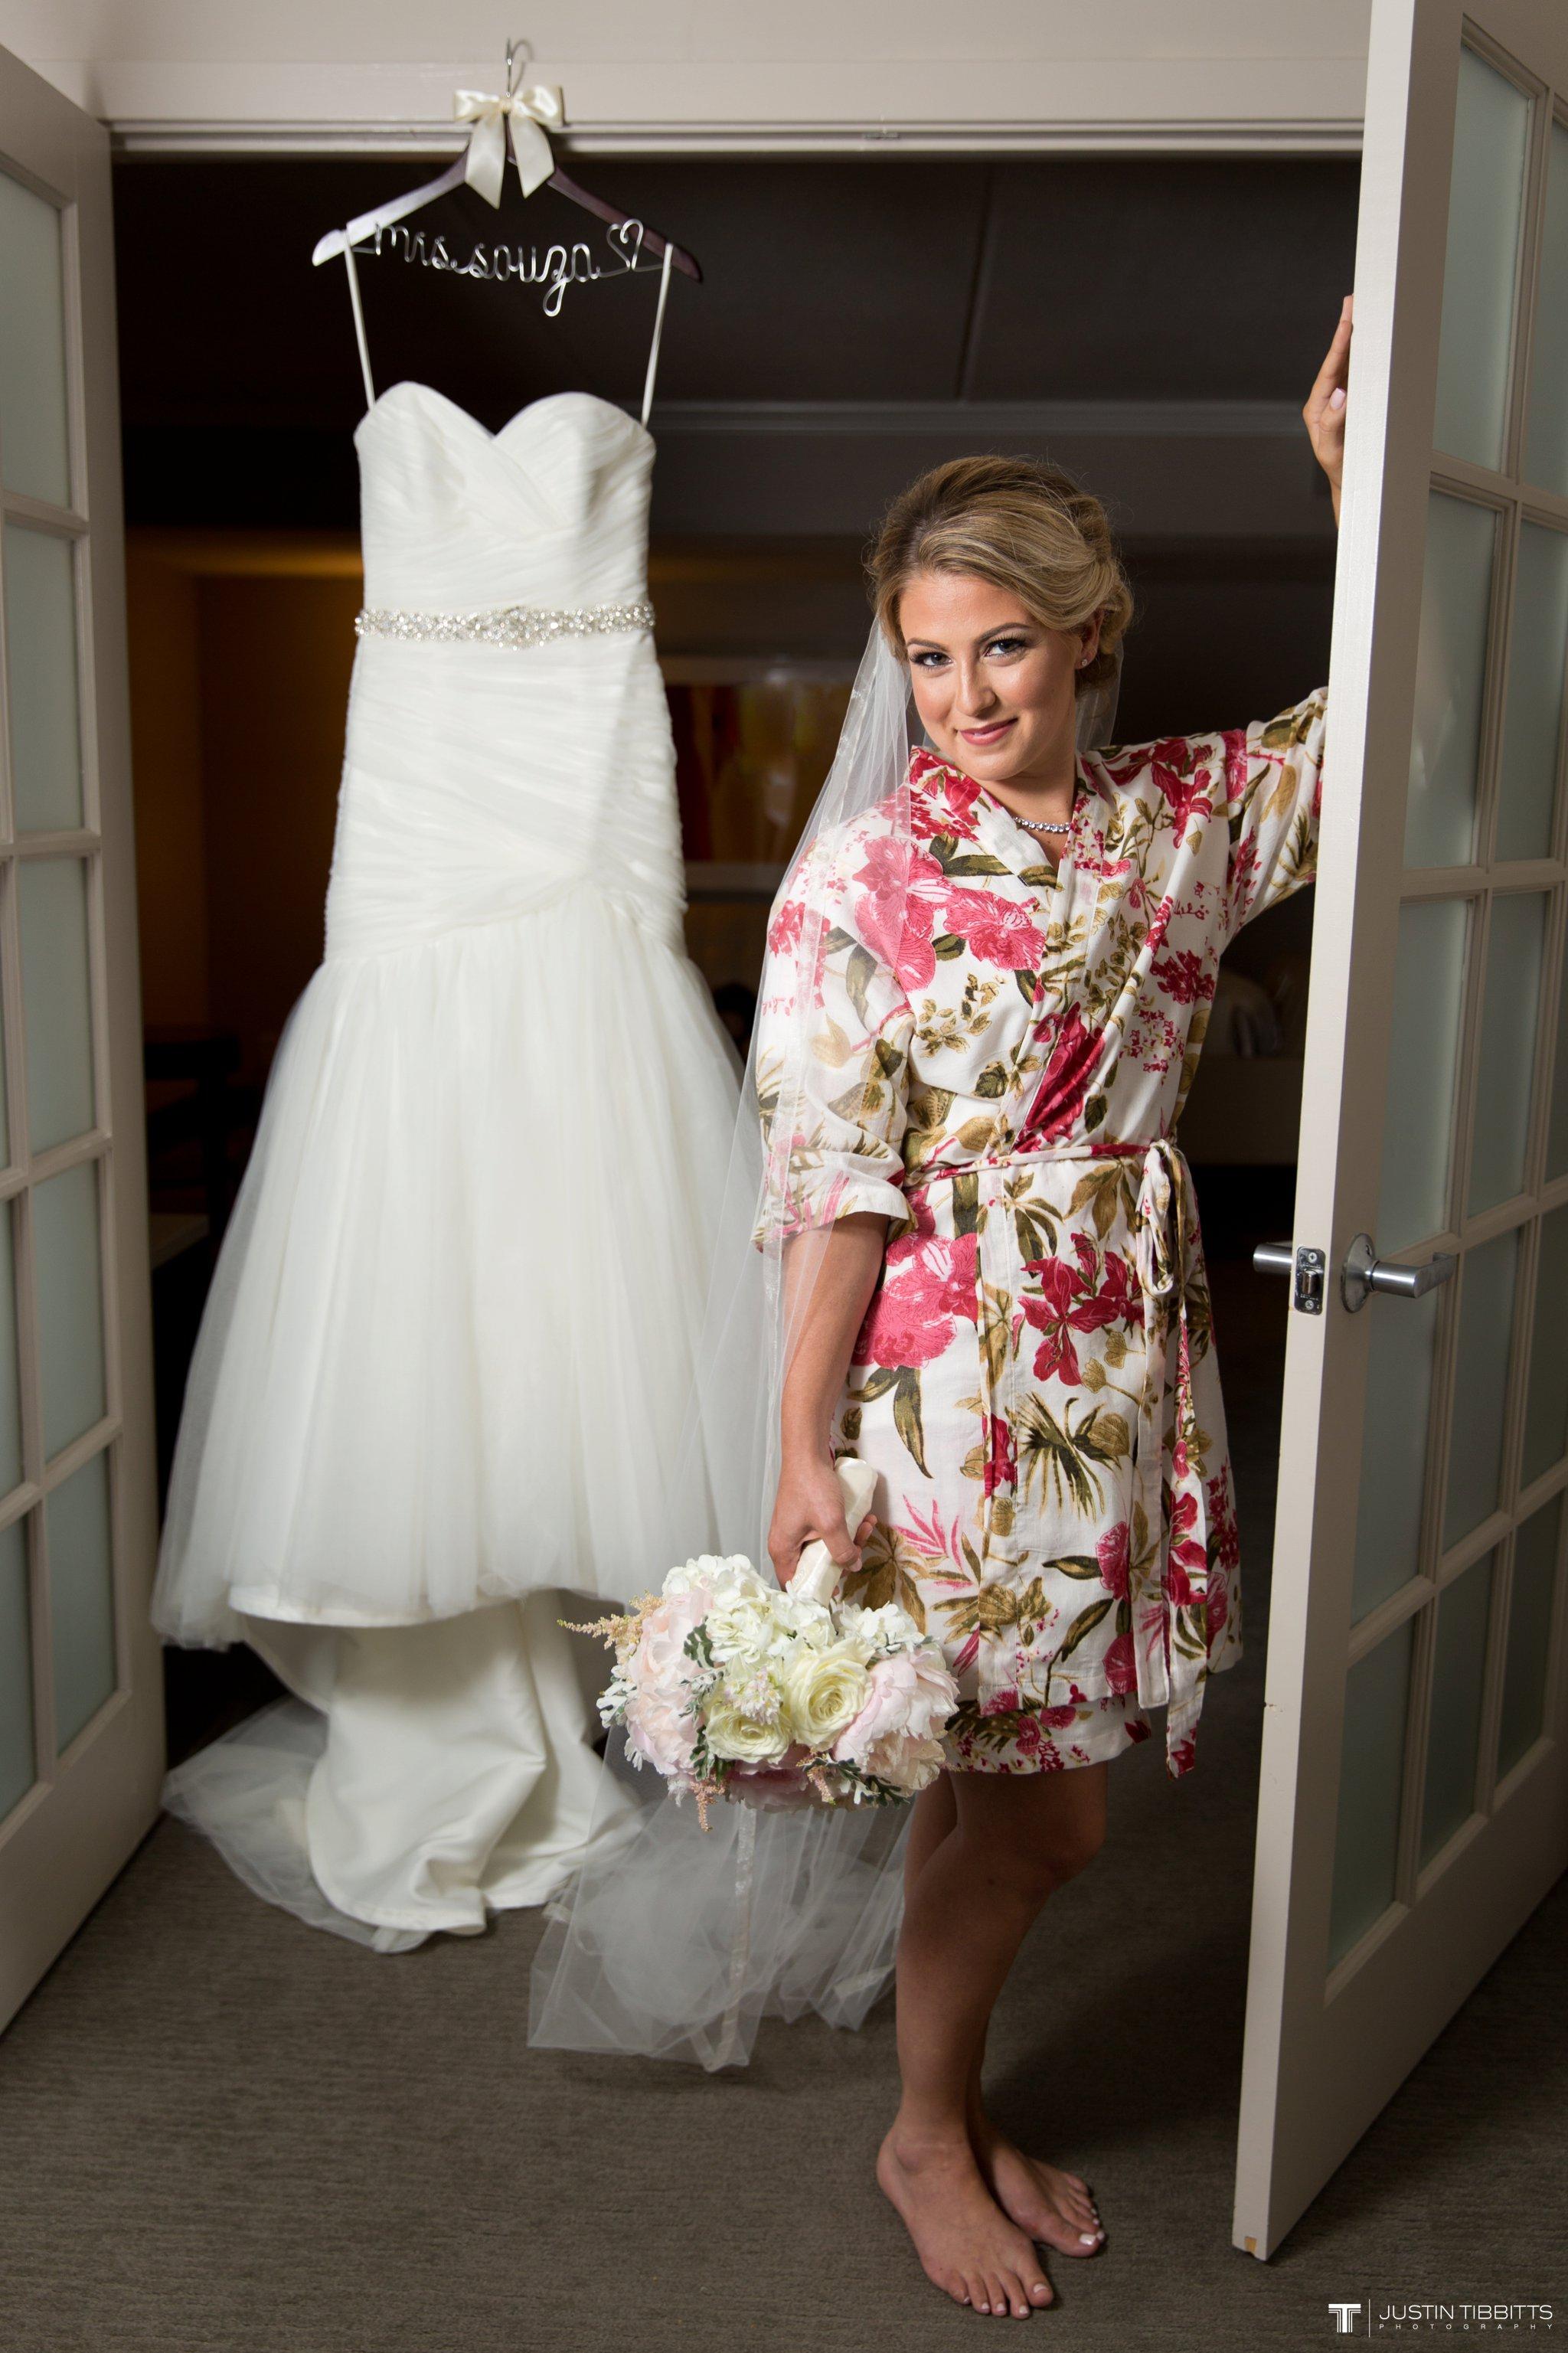 state-room-wedding-photos-with-amanda-and-nick_0032